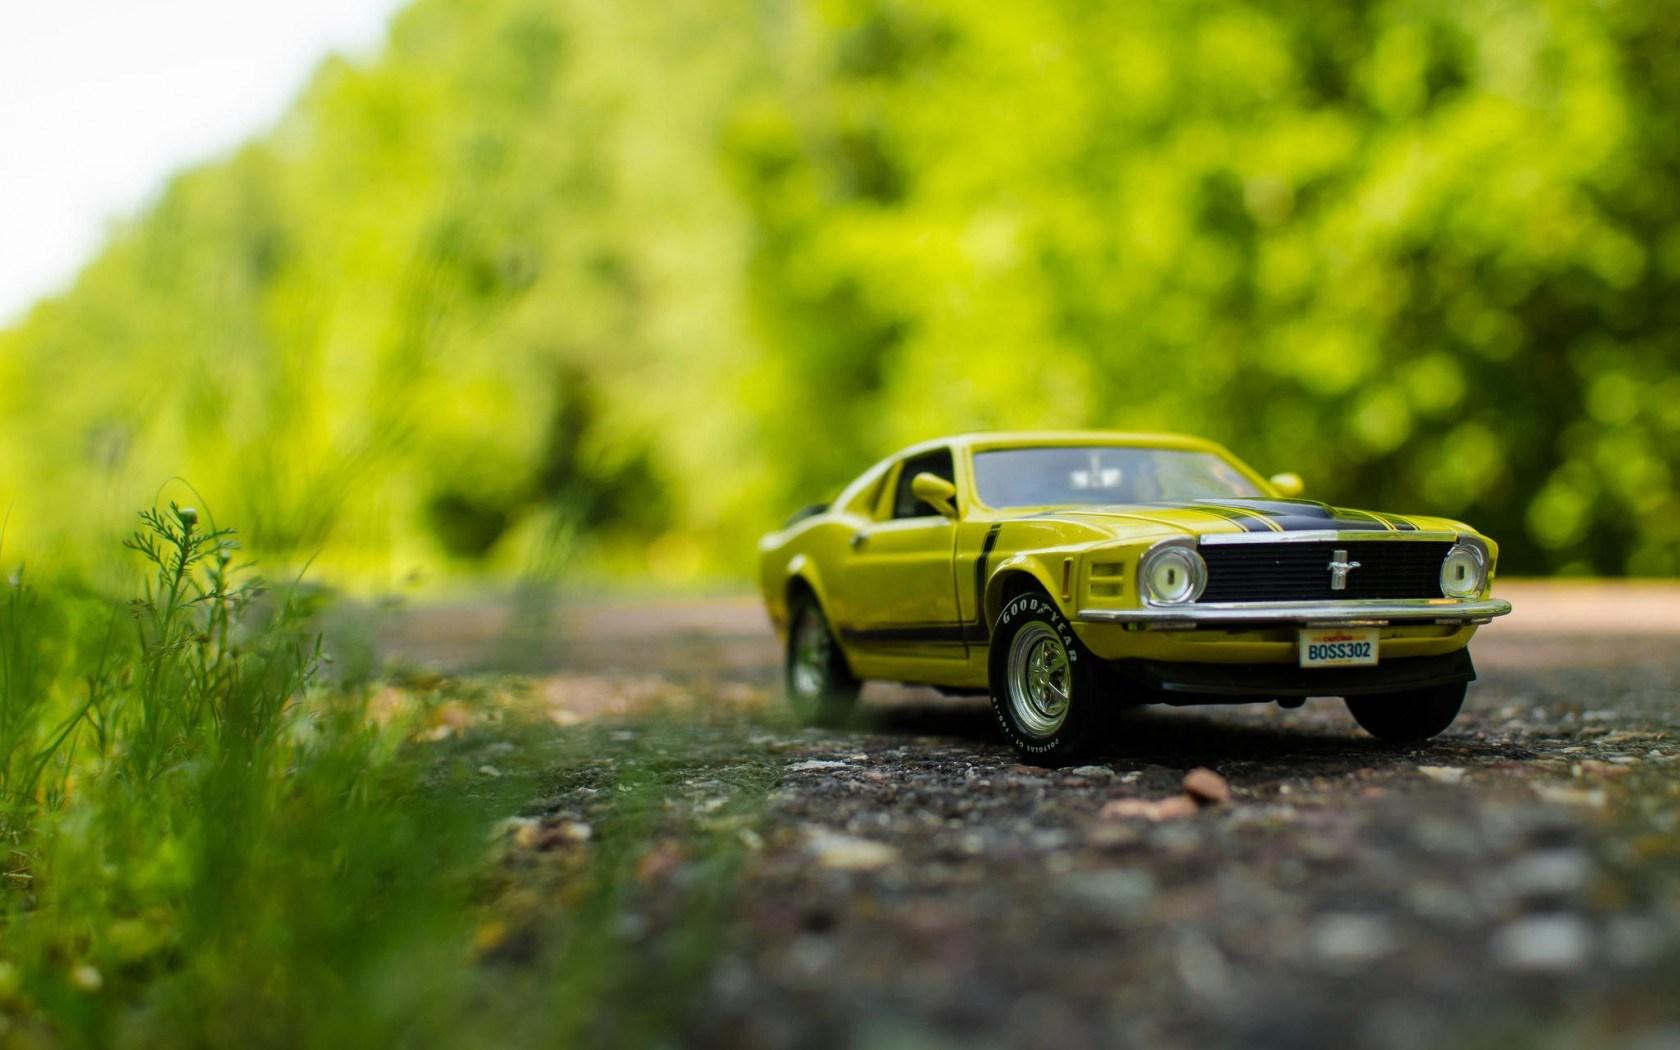 Hd wallpaper cars - Toy Car 39191